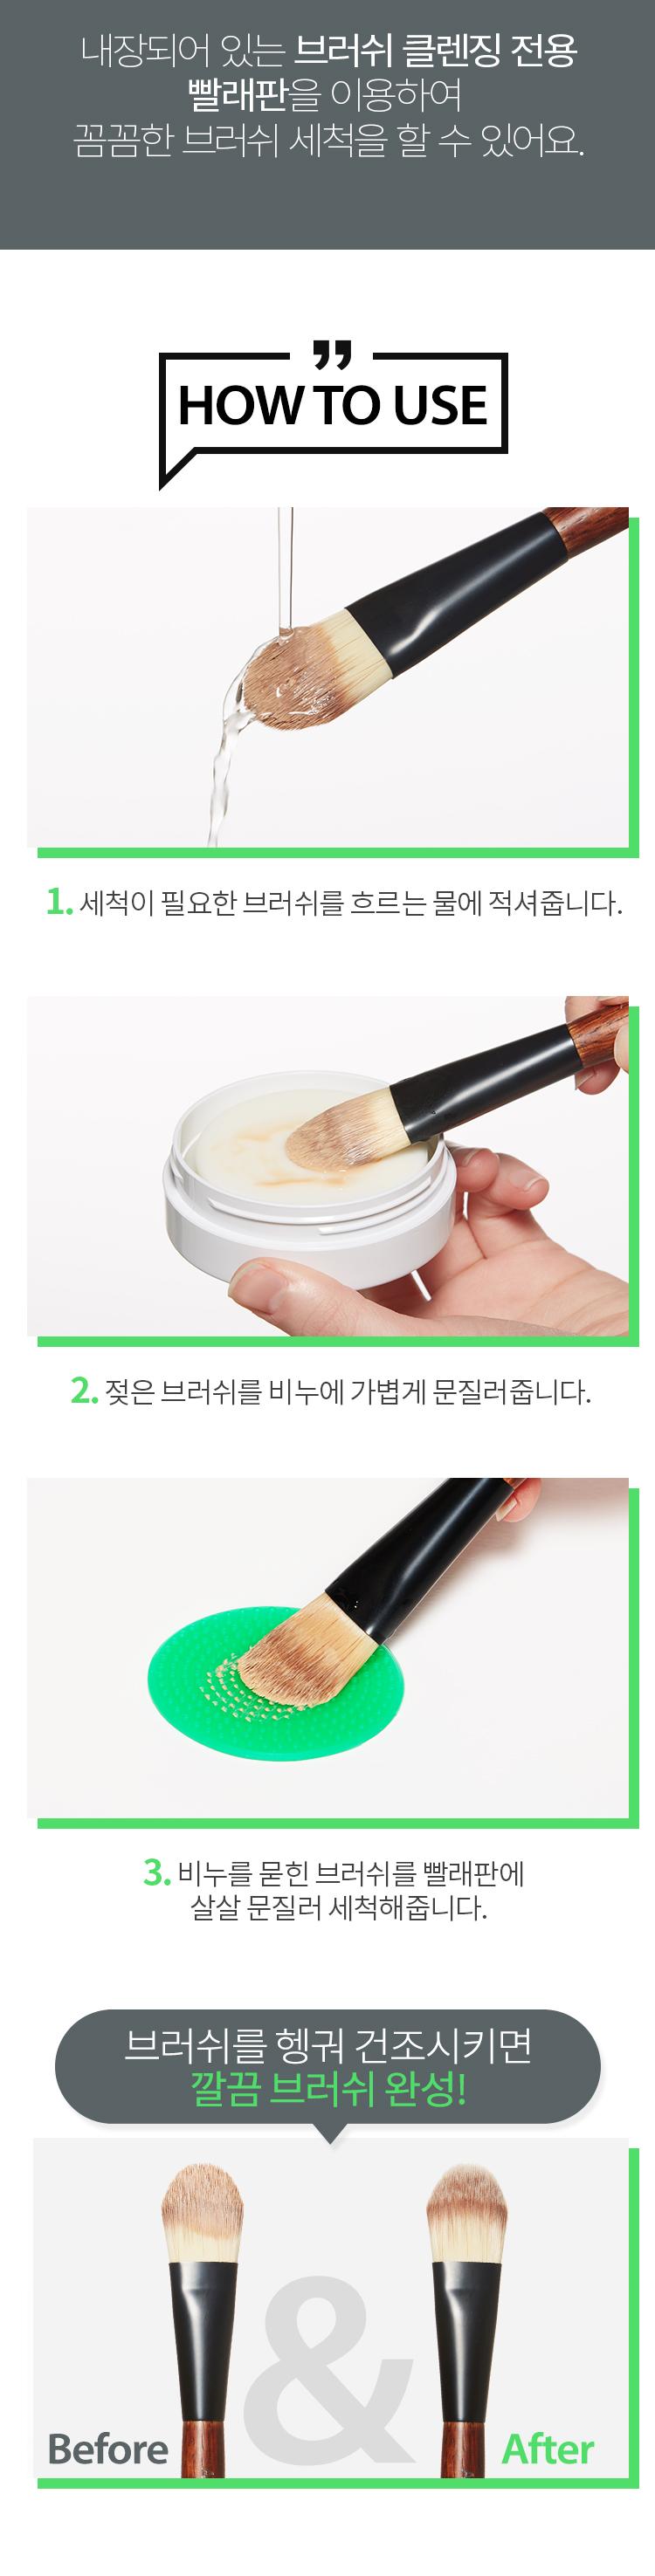 APIEU_No_Dirty_Brush_Cleansing_Soap_03.jpg